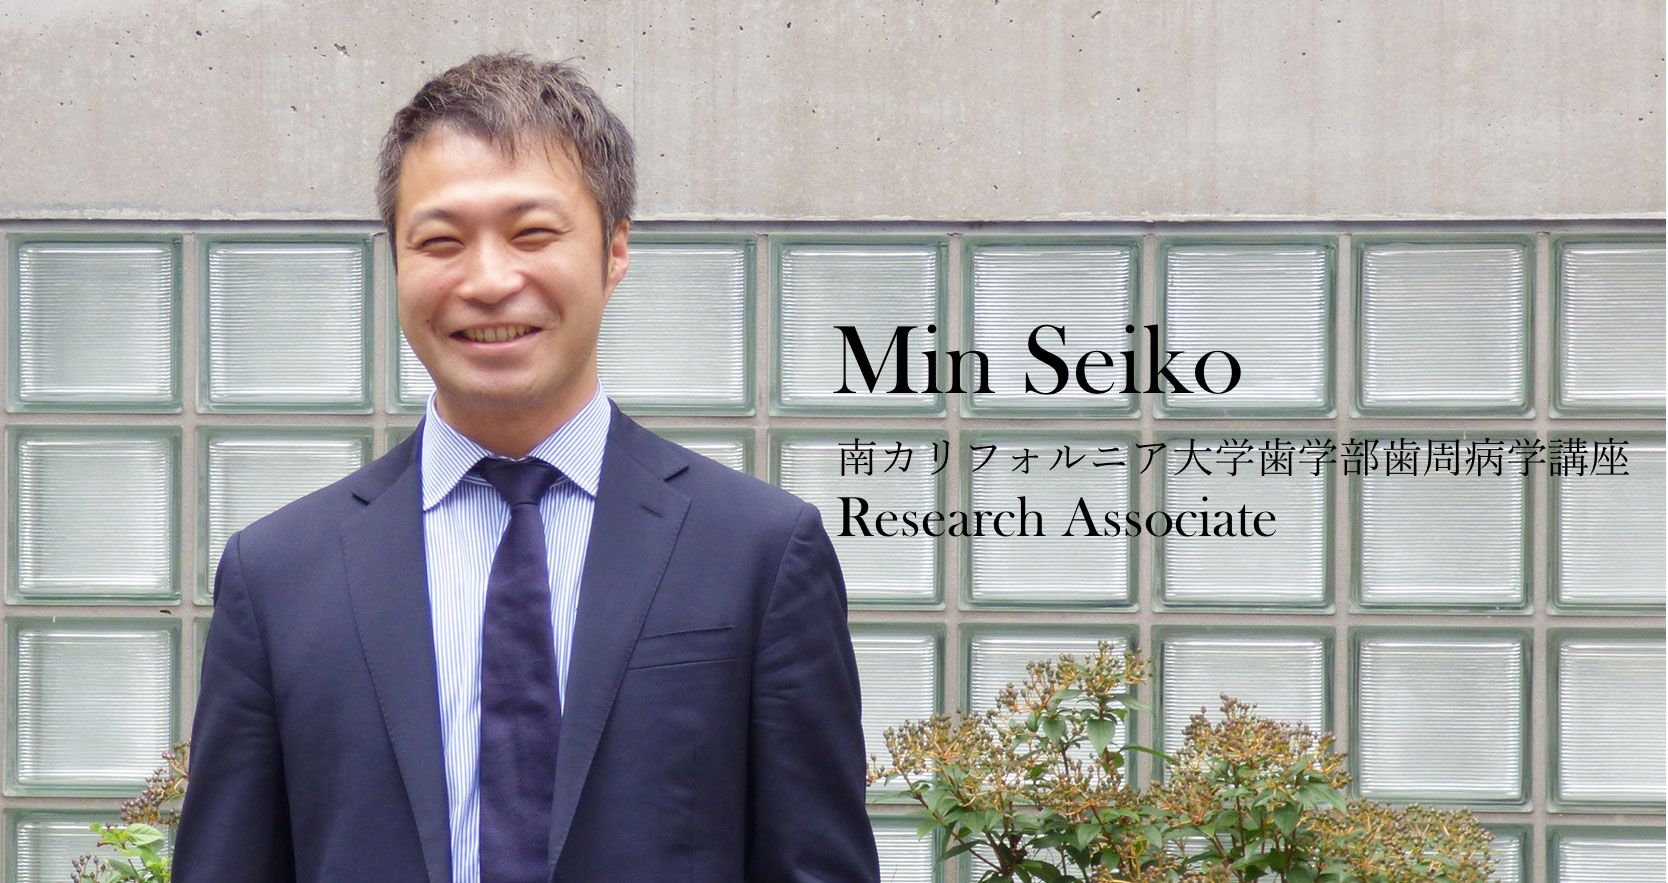 Min Seiko先生『世界で活躍する日本人ペリオドンティストの軌跡』